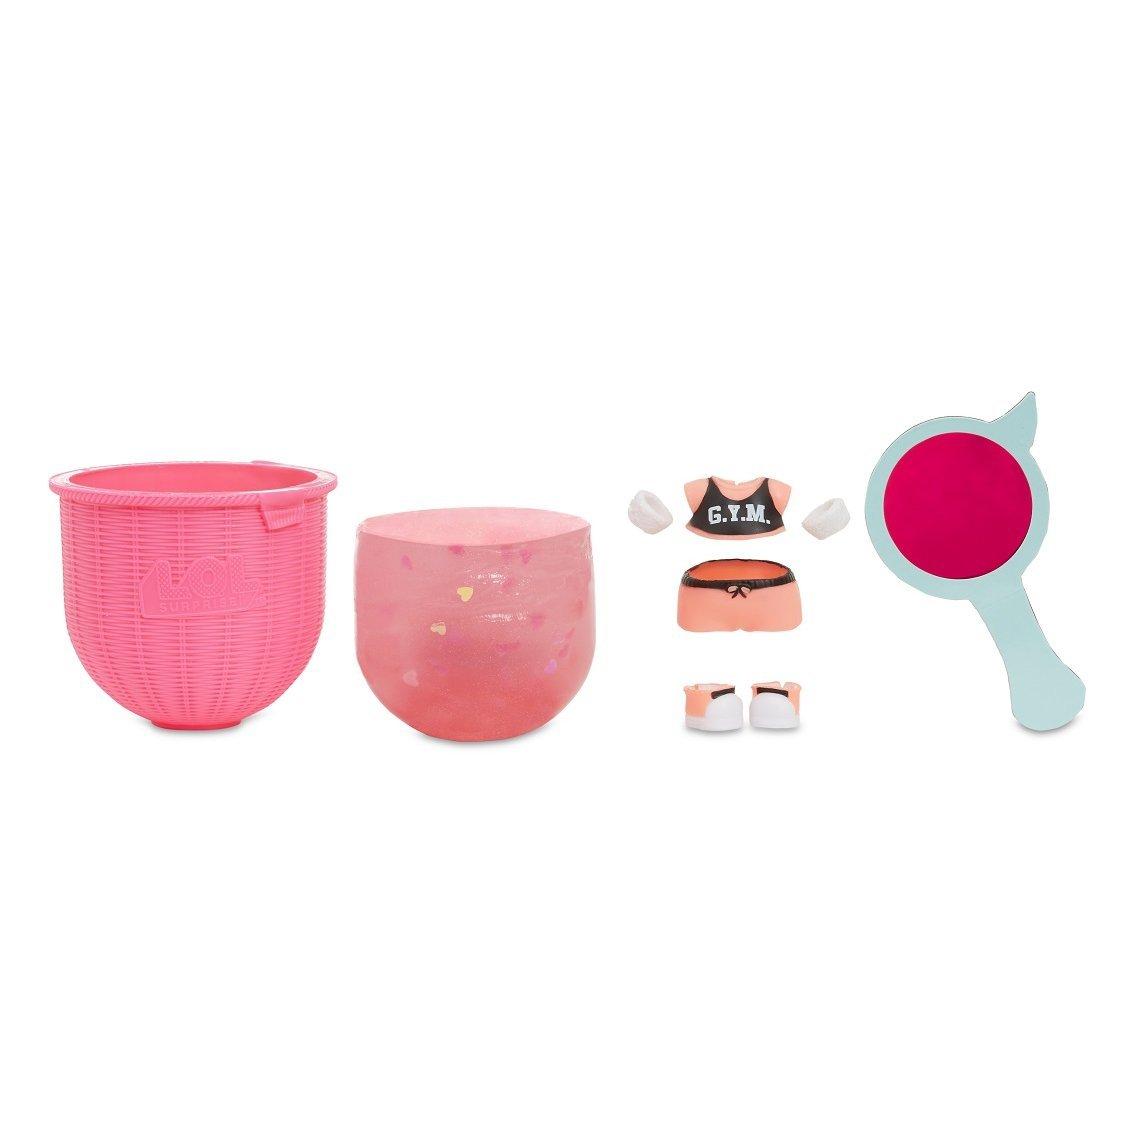 Lol Surprise Fashion Crush 3 Surpresas - Acessórios Para Mini Boneca - Candide 8920